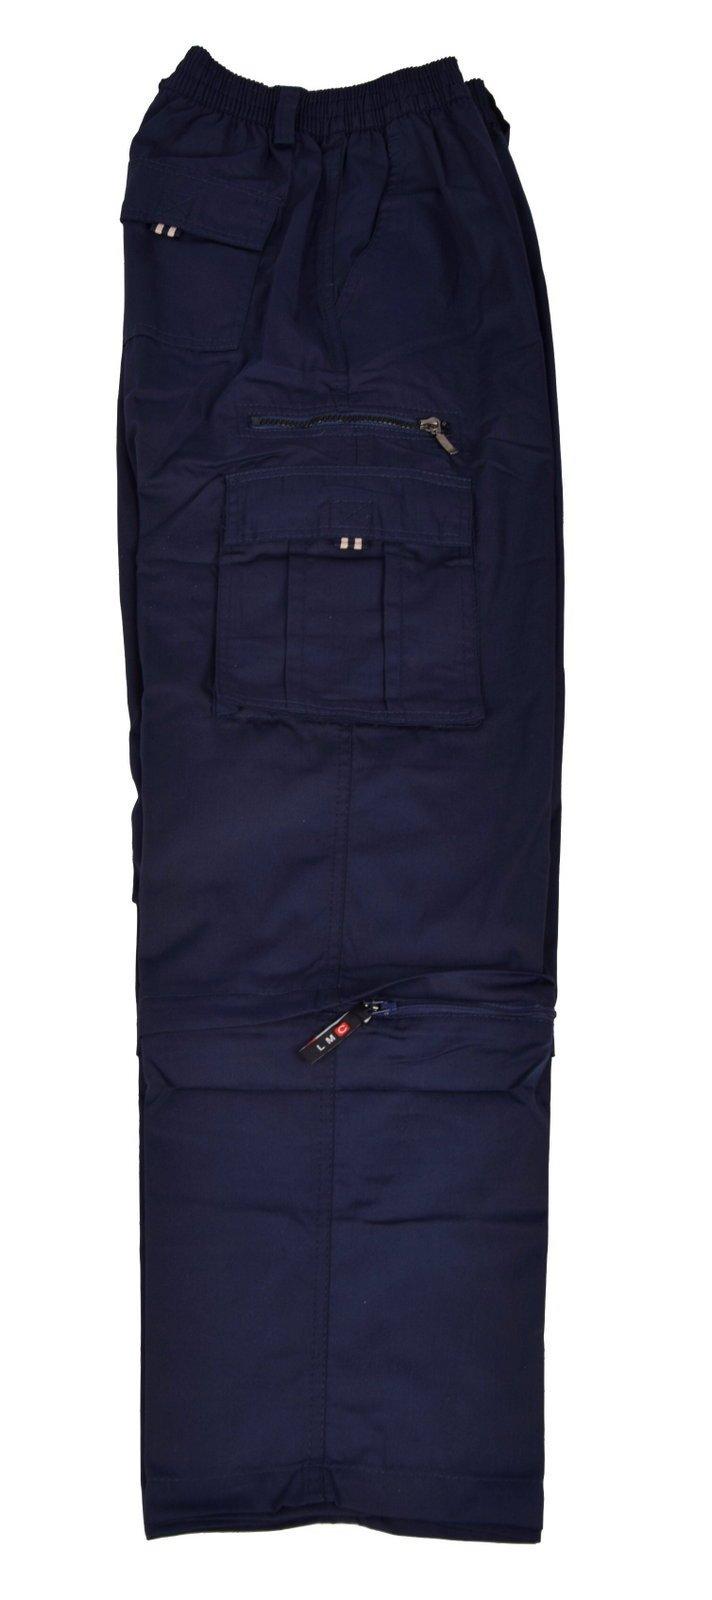 Iwea Herren Cargohose Outdoor Freizeithose Arbeitshose Cargo Hose Lang  Trekkinghose Casual Pants IW061 (M, 51f706b645